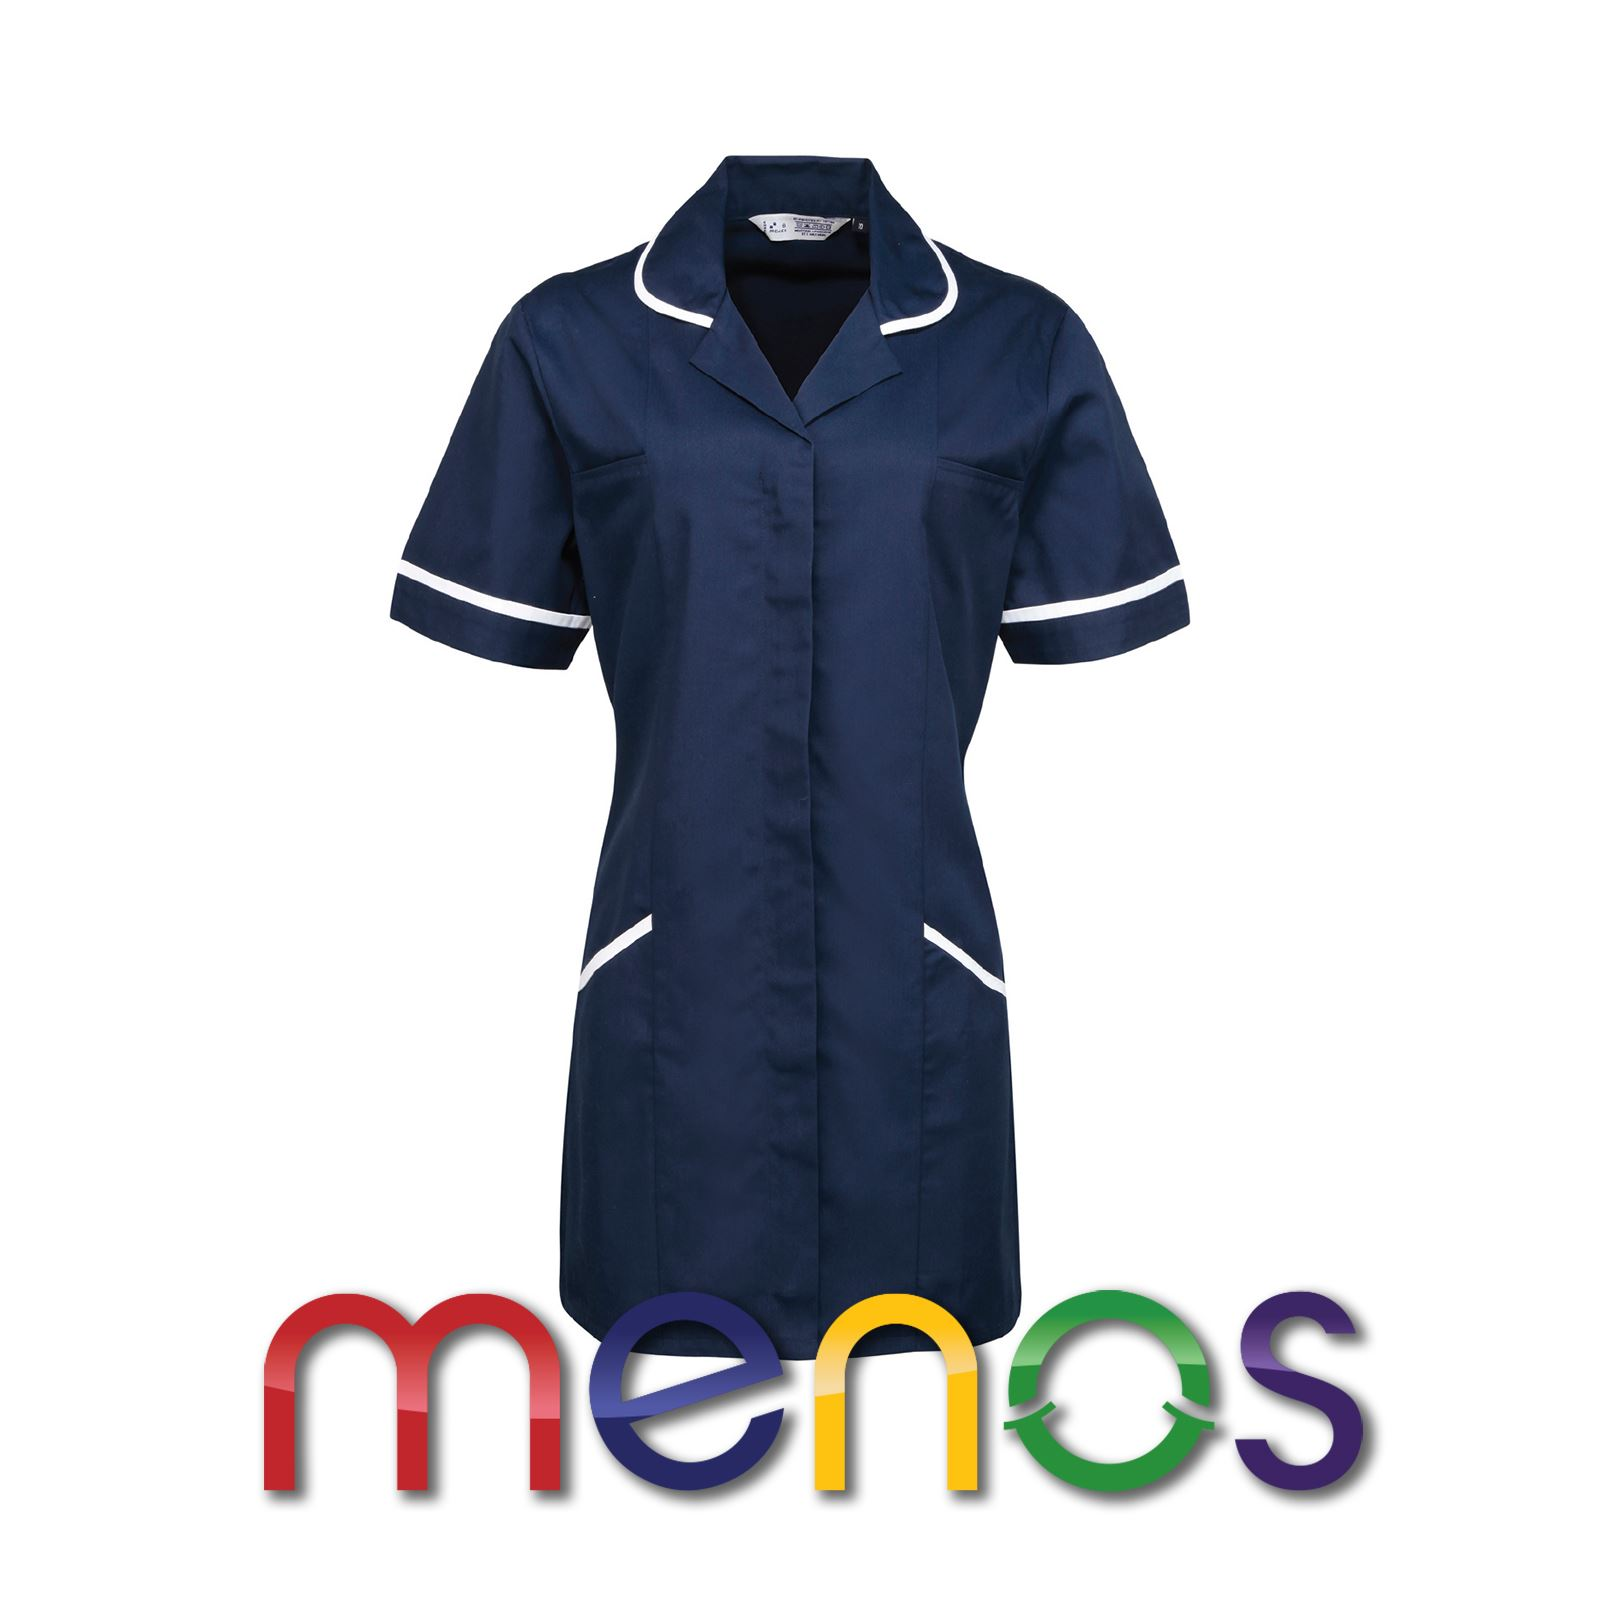 Premier ladies vitality healthcare tunic pr604 spa for Spa uniform amazon